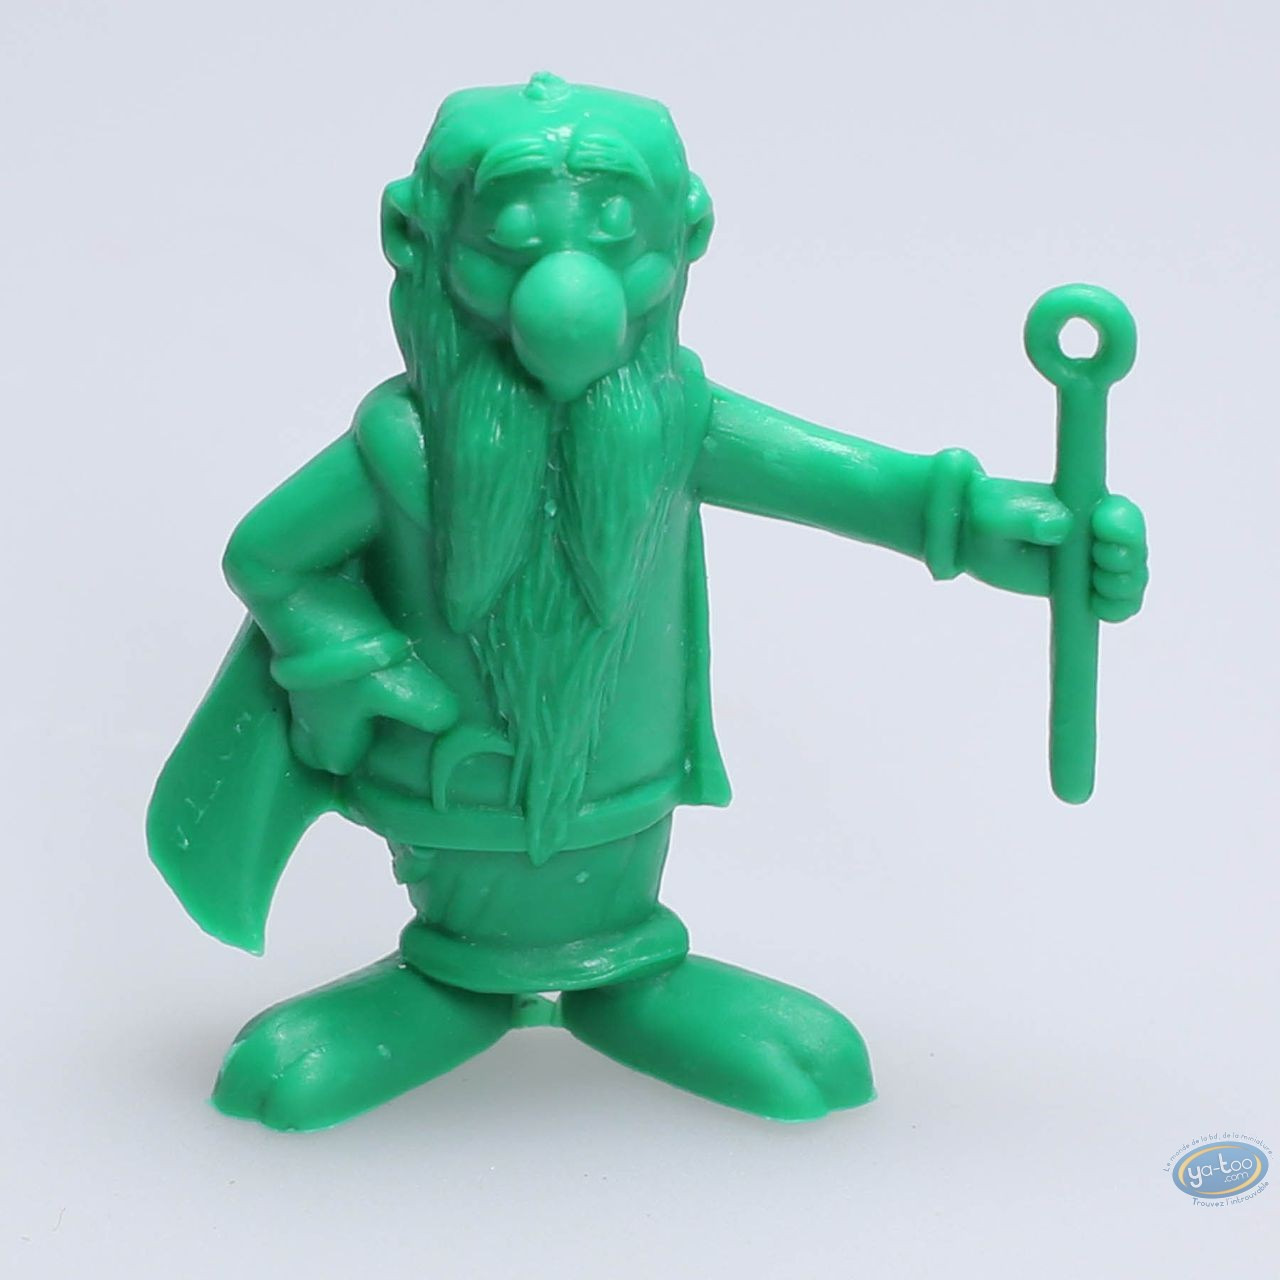 Figurine plastique, Astérix : Mini Panoramix (vert clair)